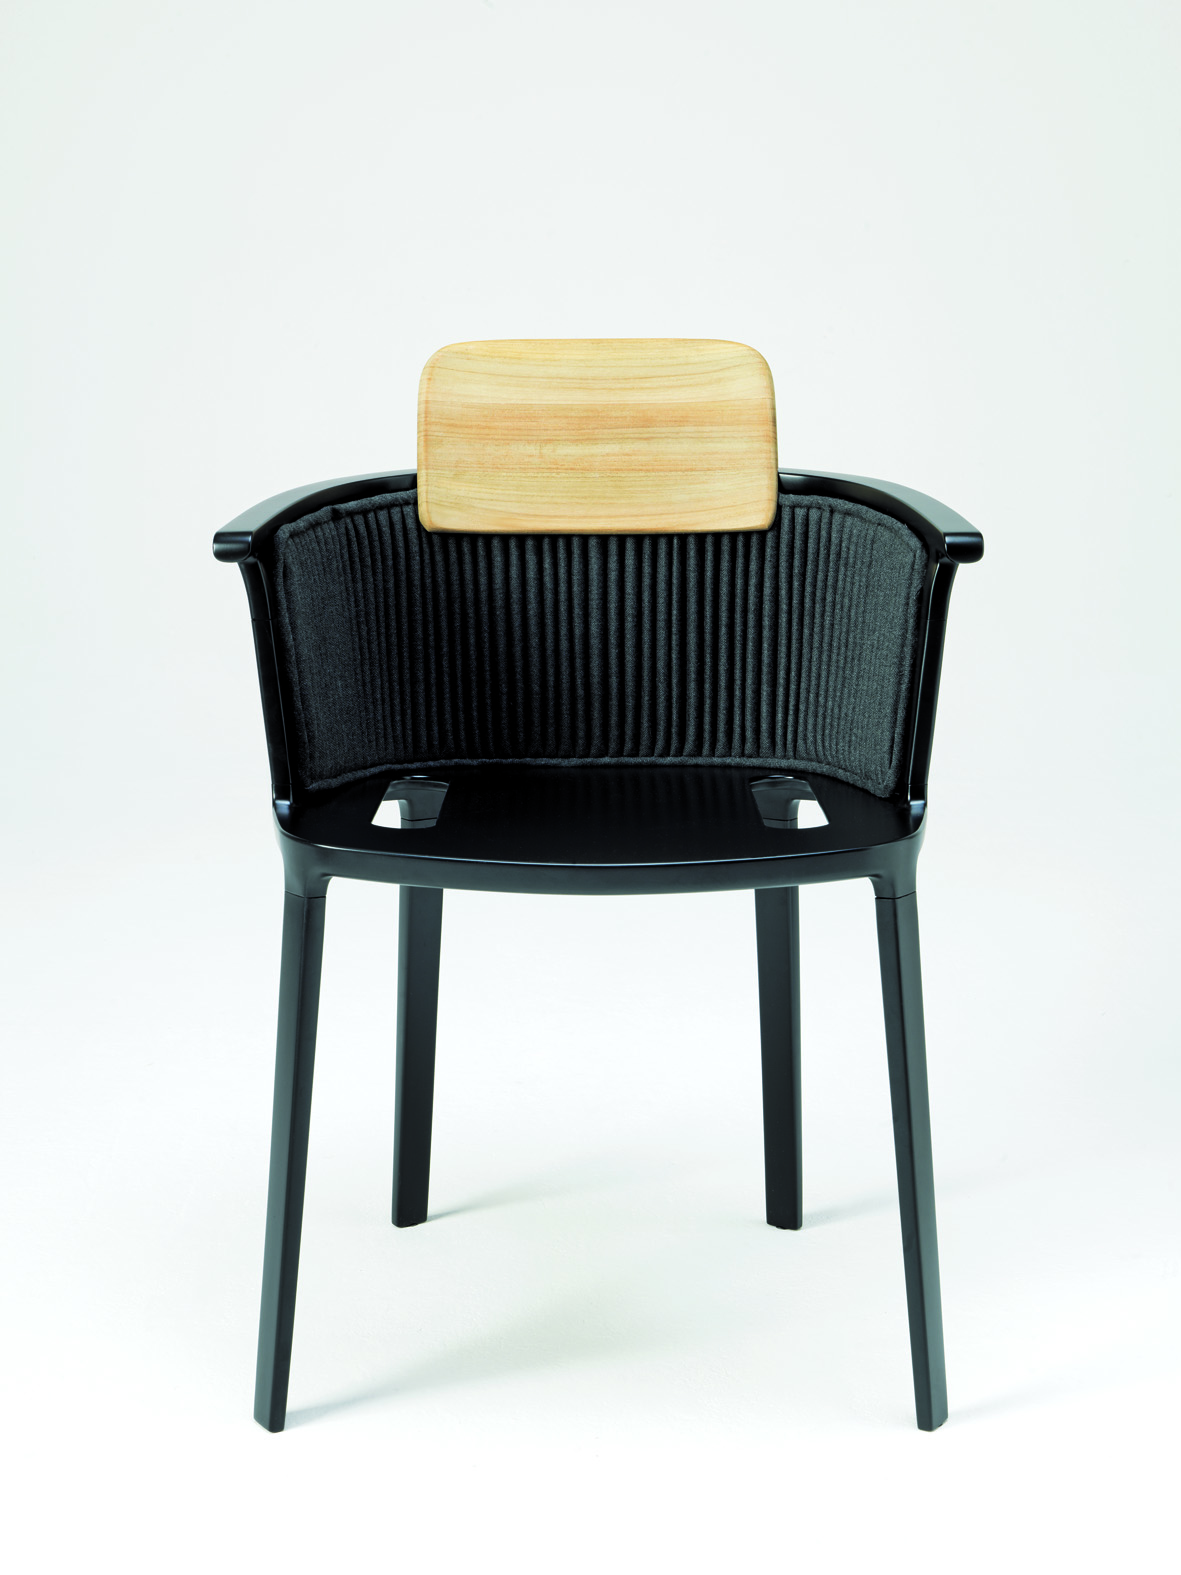 EthimoのためのニコレットシートデザインパトリックNorguet